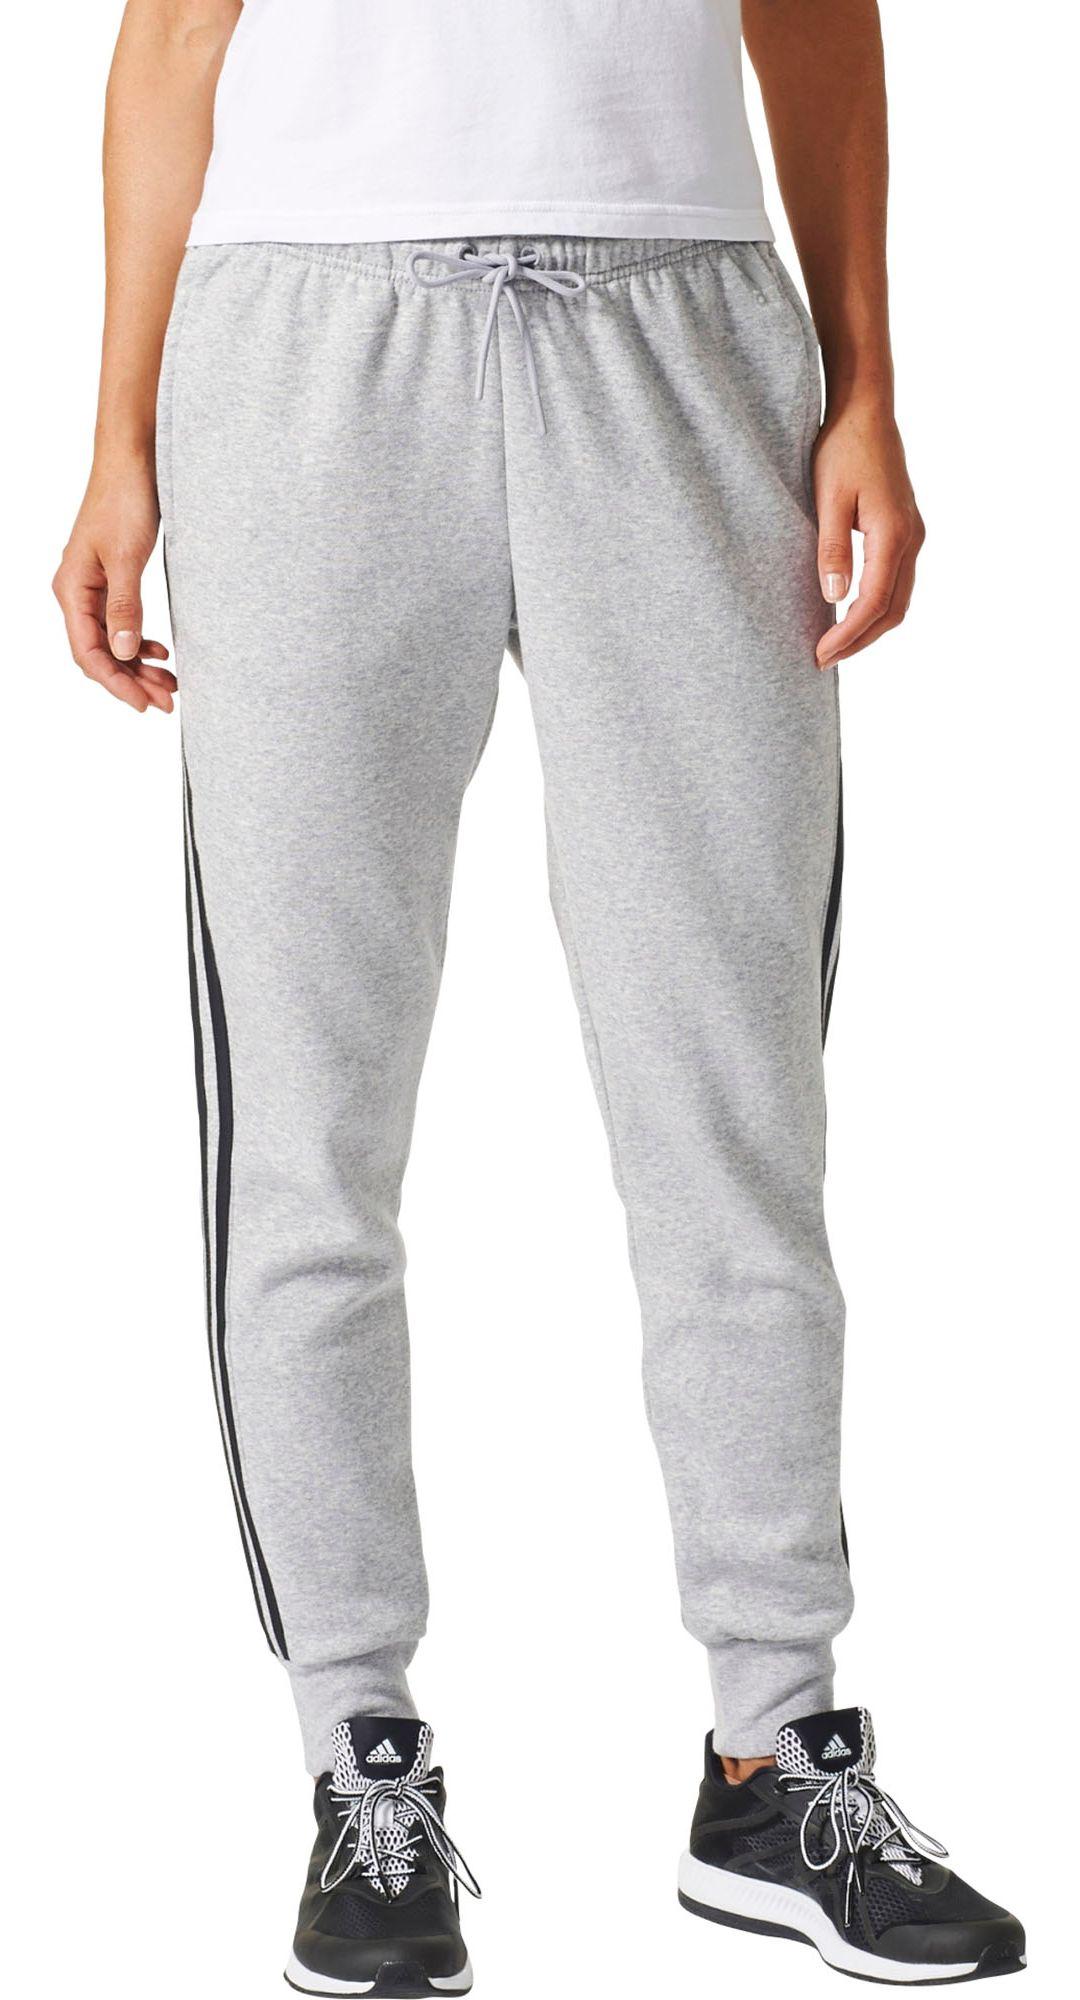 dec31464 adidas Women's Essentials Cotton Fleece 3-Stripes Jogger Pants.  noImageFound. Previous